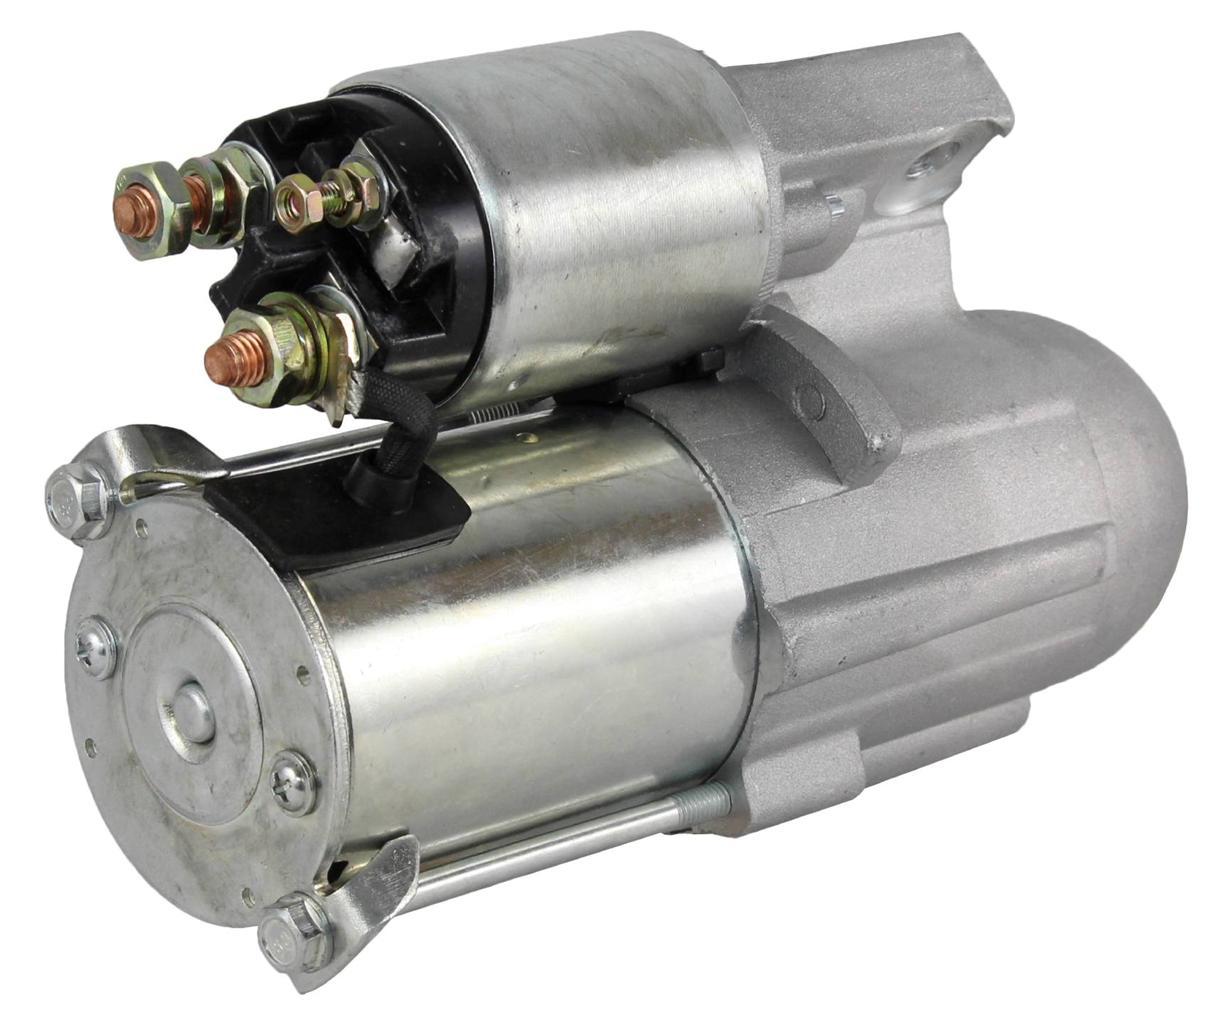 Starter Fit Buick Rendezvous 3.4L Saturn Relay Pontiac Grand AM 3231626 12563764